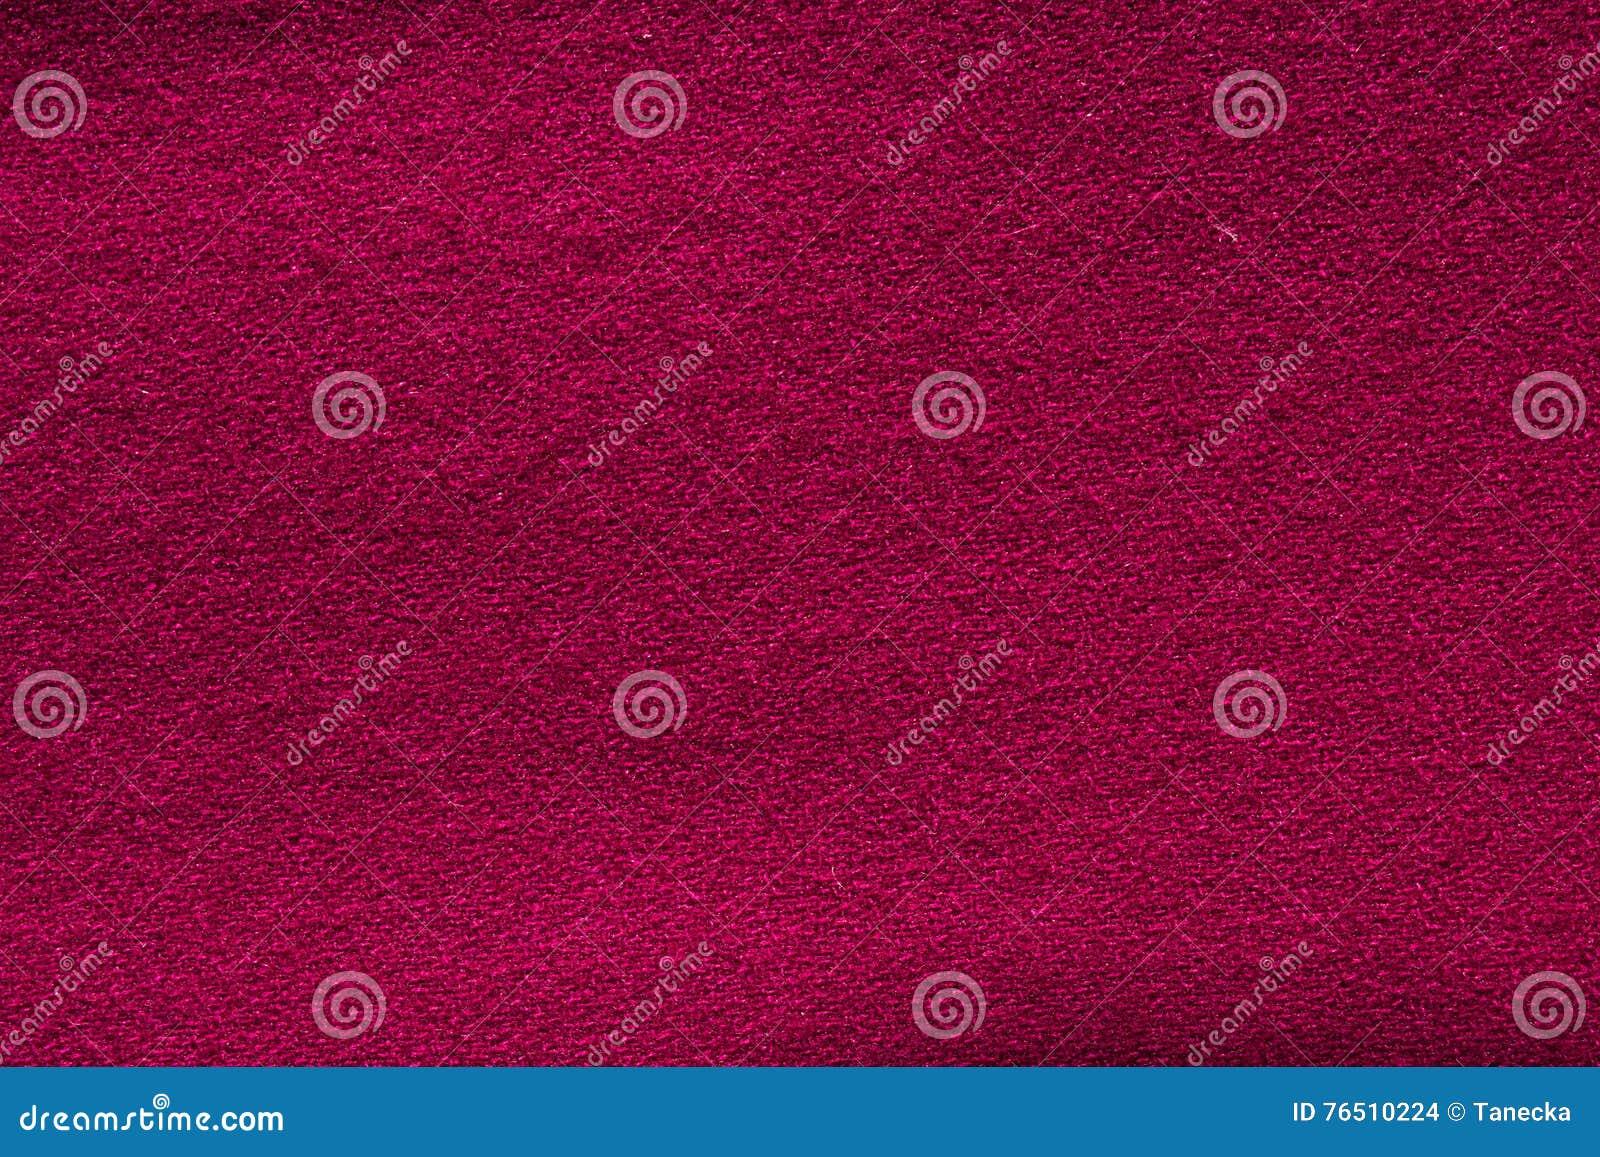 Close up crimson woollen knitted fabric texture. Loden background